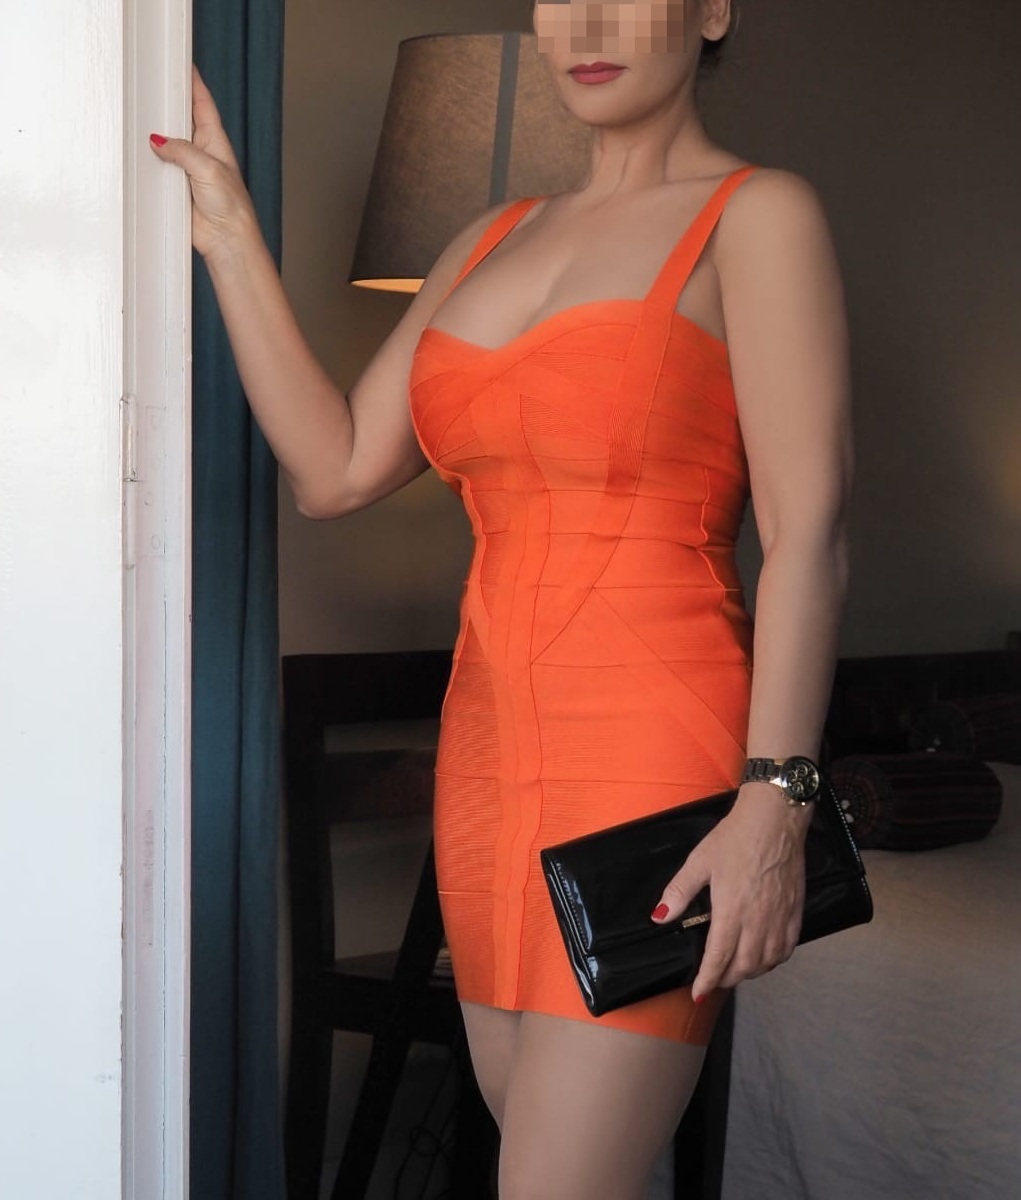 lady-valerie-aus-karlsruhe-perfect-date-escort-008-2.jpg